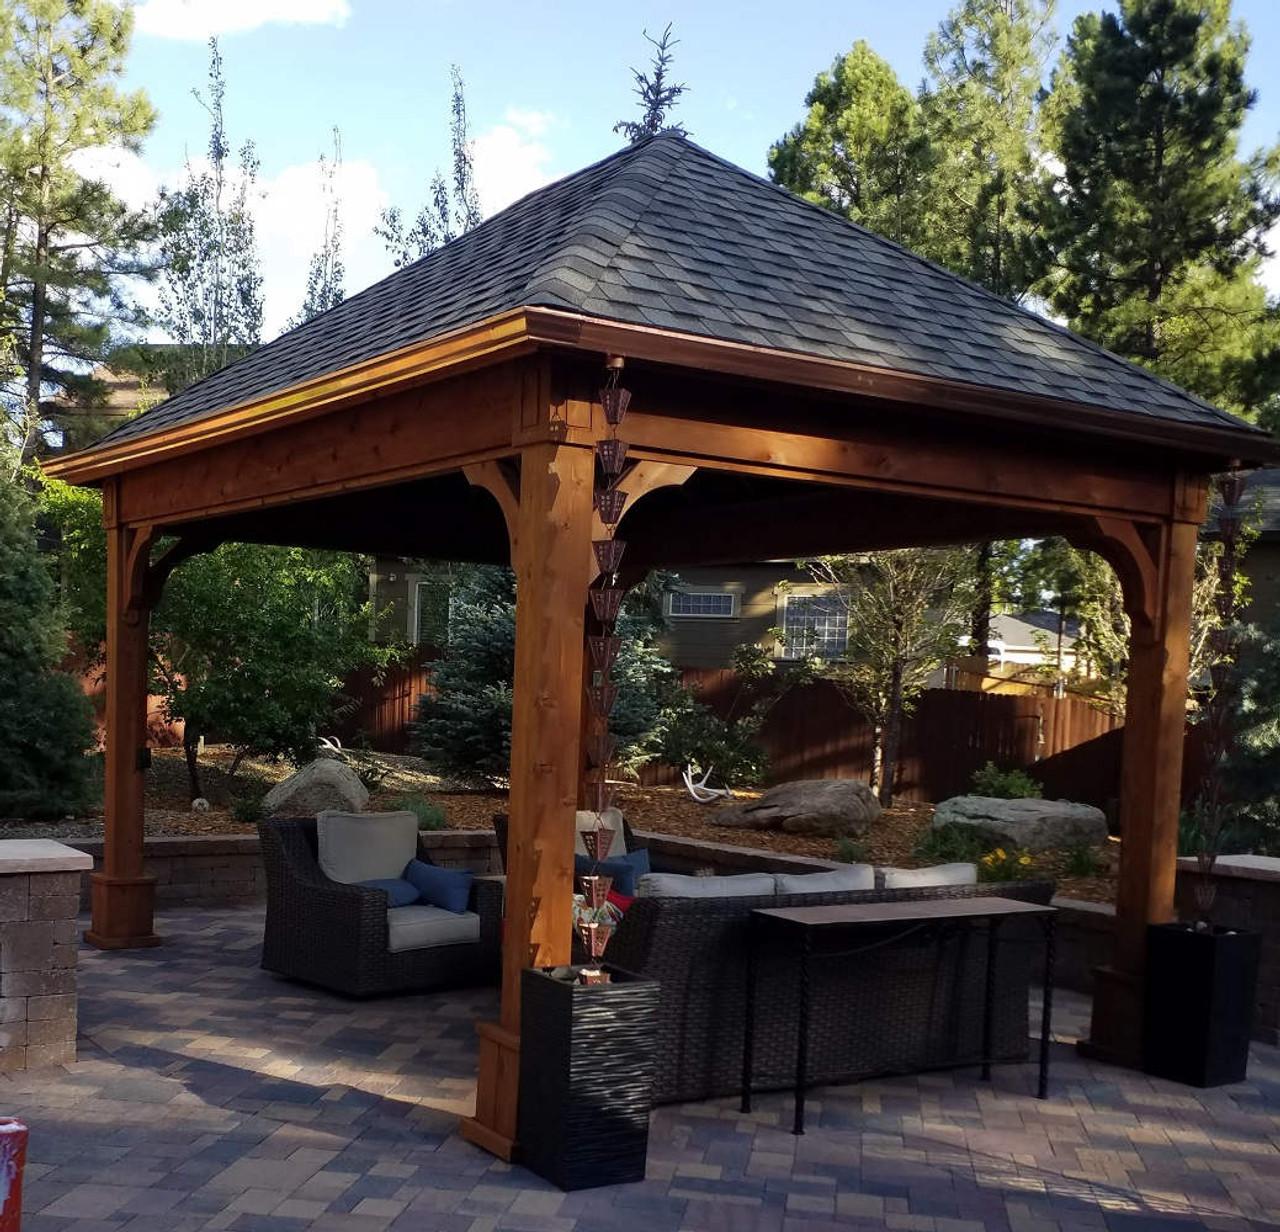 12x16 Traditional Roof Cedar Pavilion, Flagstaff, Arizona